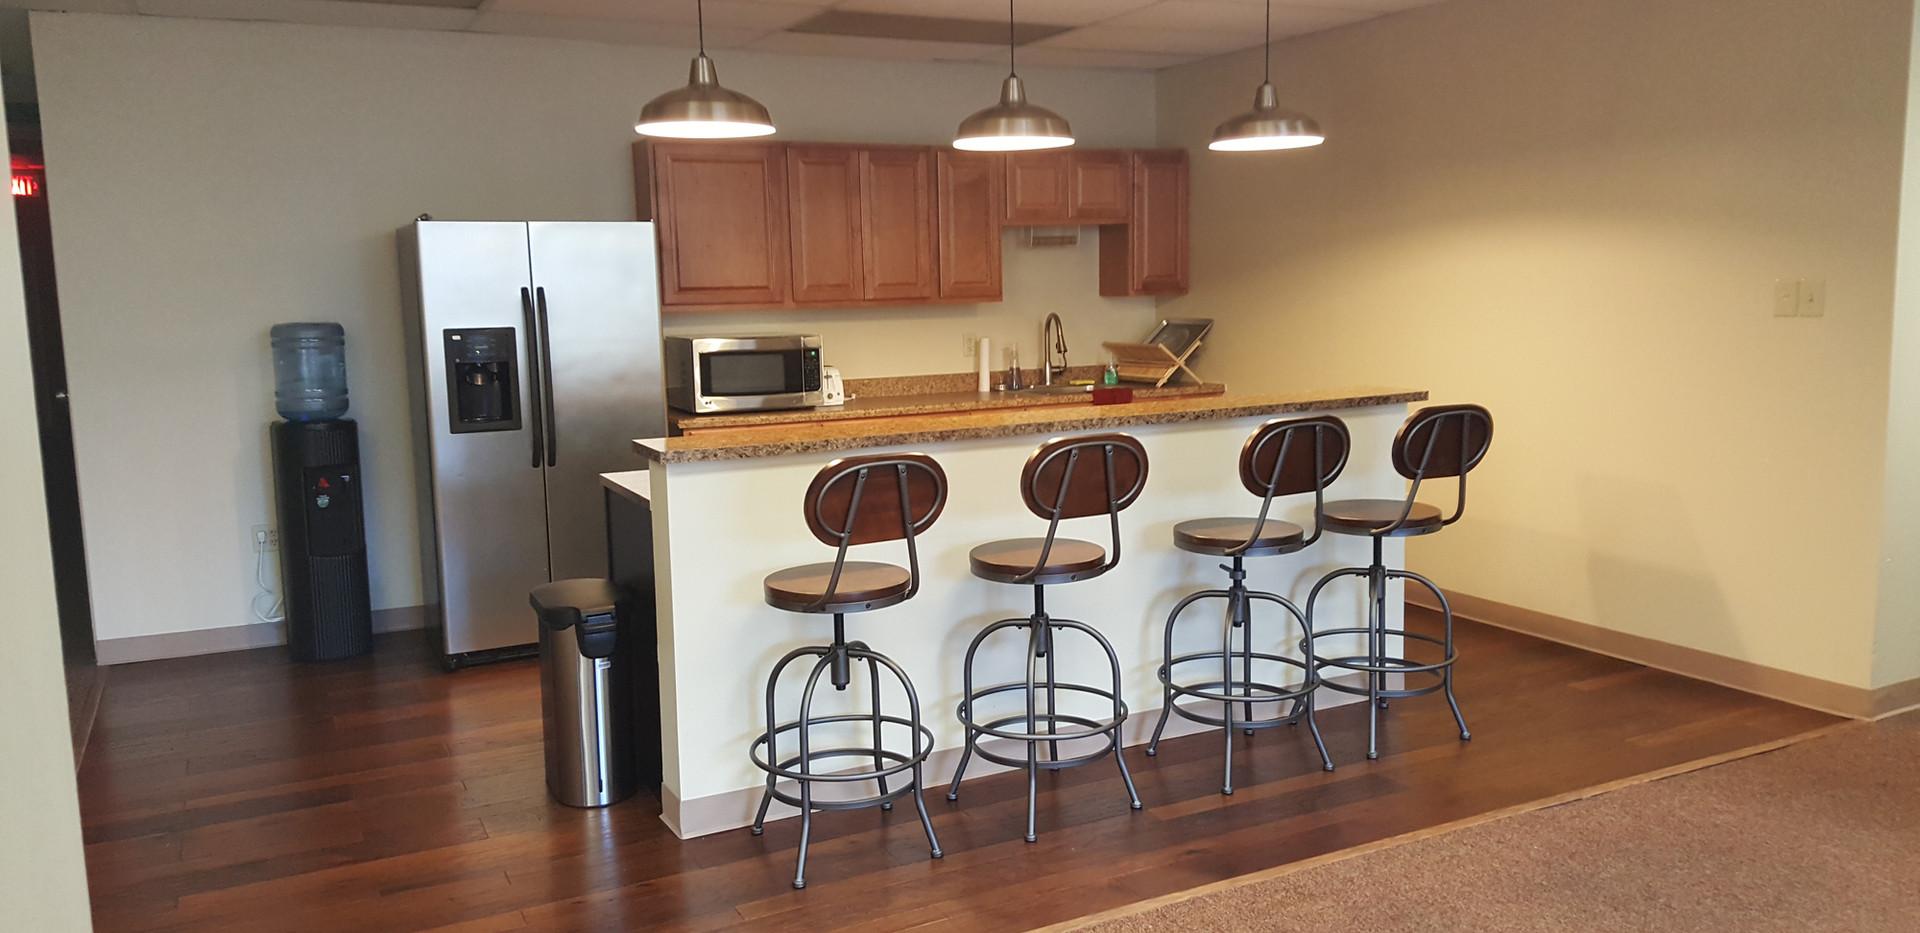 Superior Office Suites Kitchen